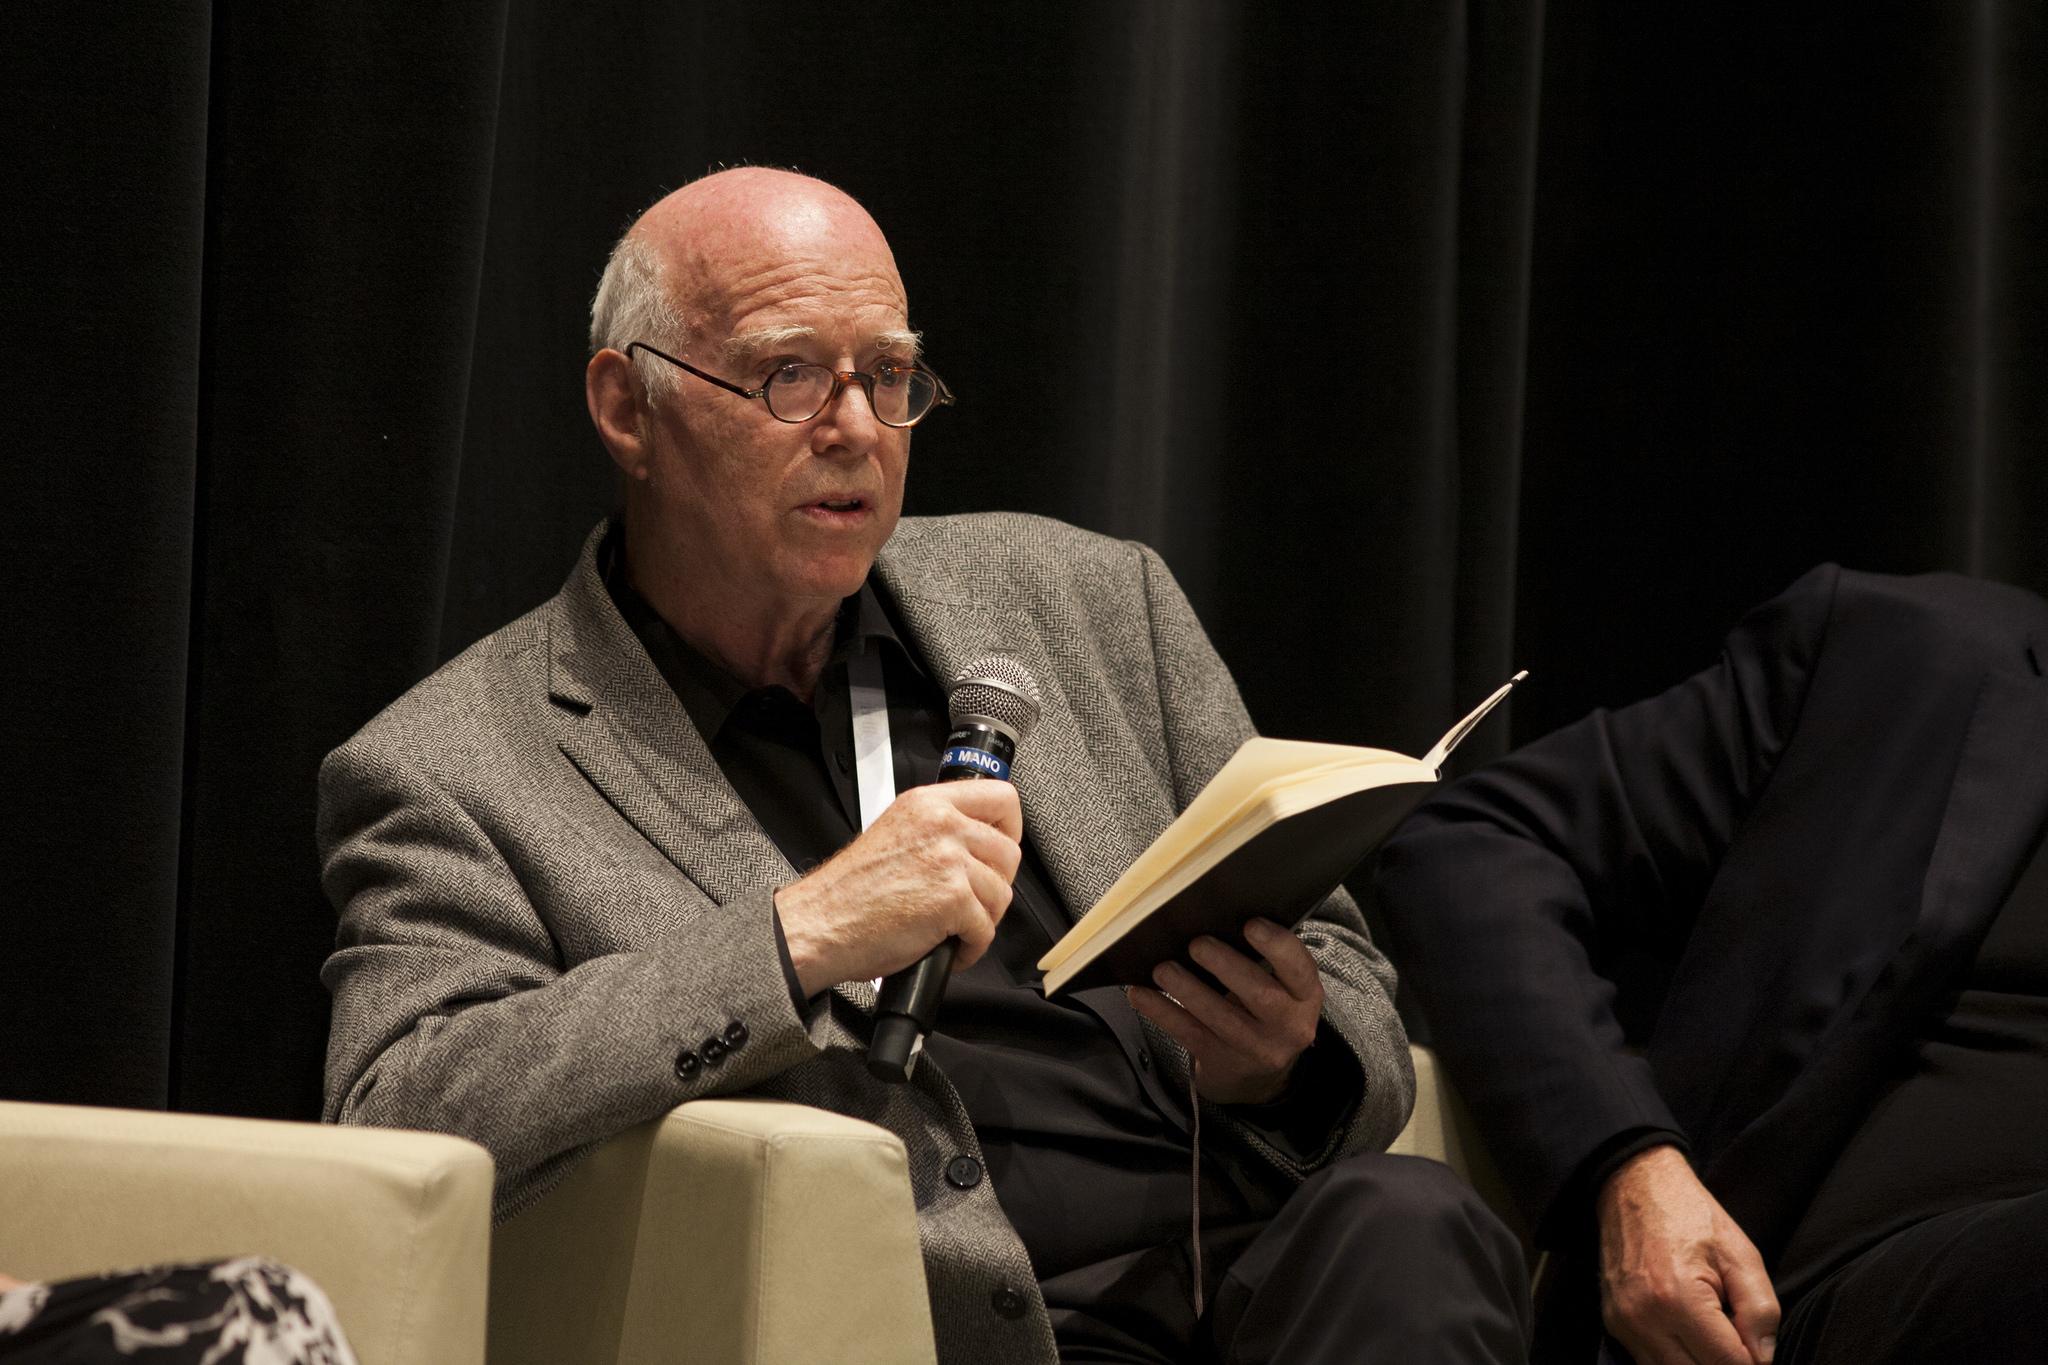 Richard Sennett, renomado sociólogo. Foto: Habitat III Conference